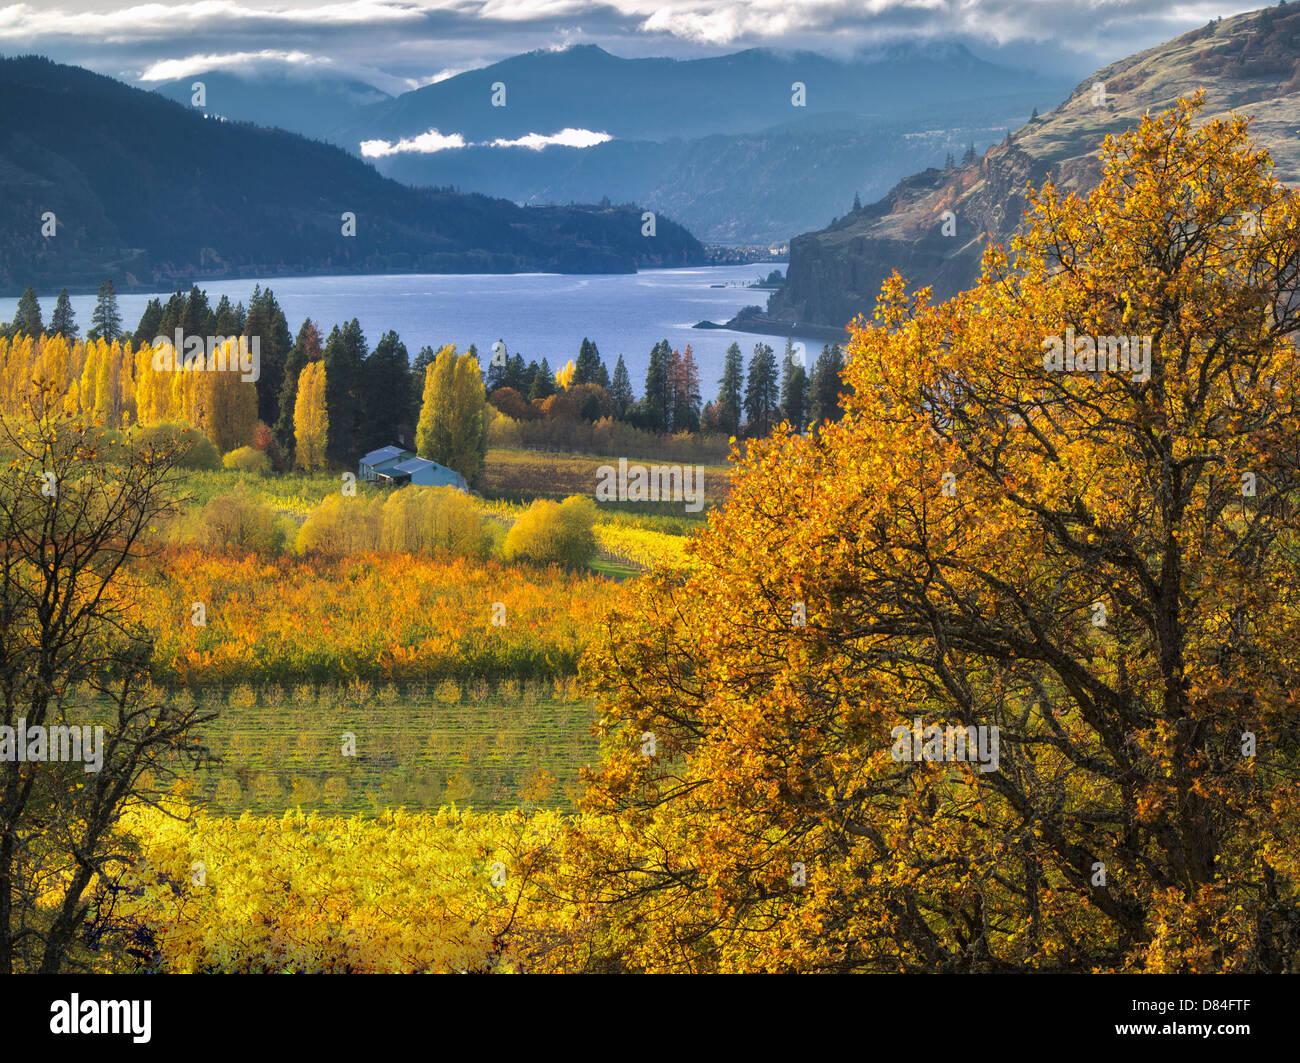 Obstgarten in Herbstfarben und Columbia River. Columbia River Gorge National Scenic Area. Oregon Stockbild